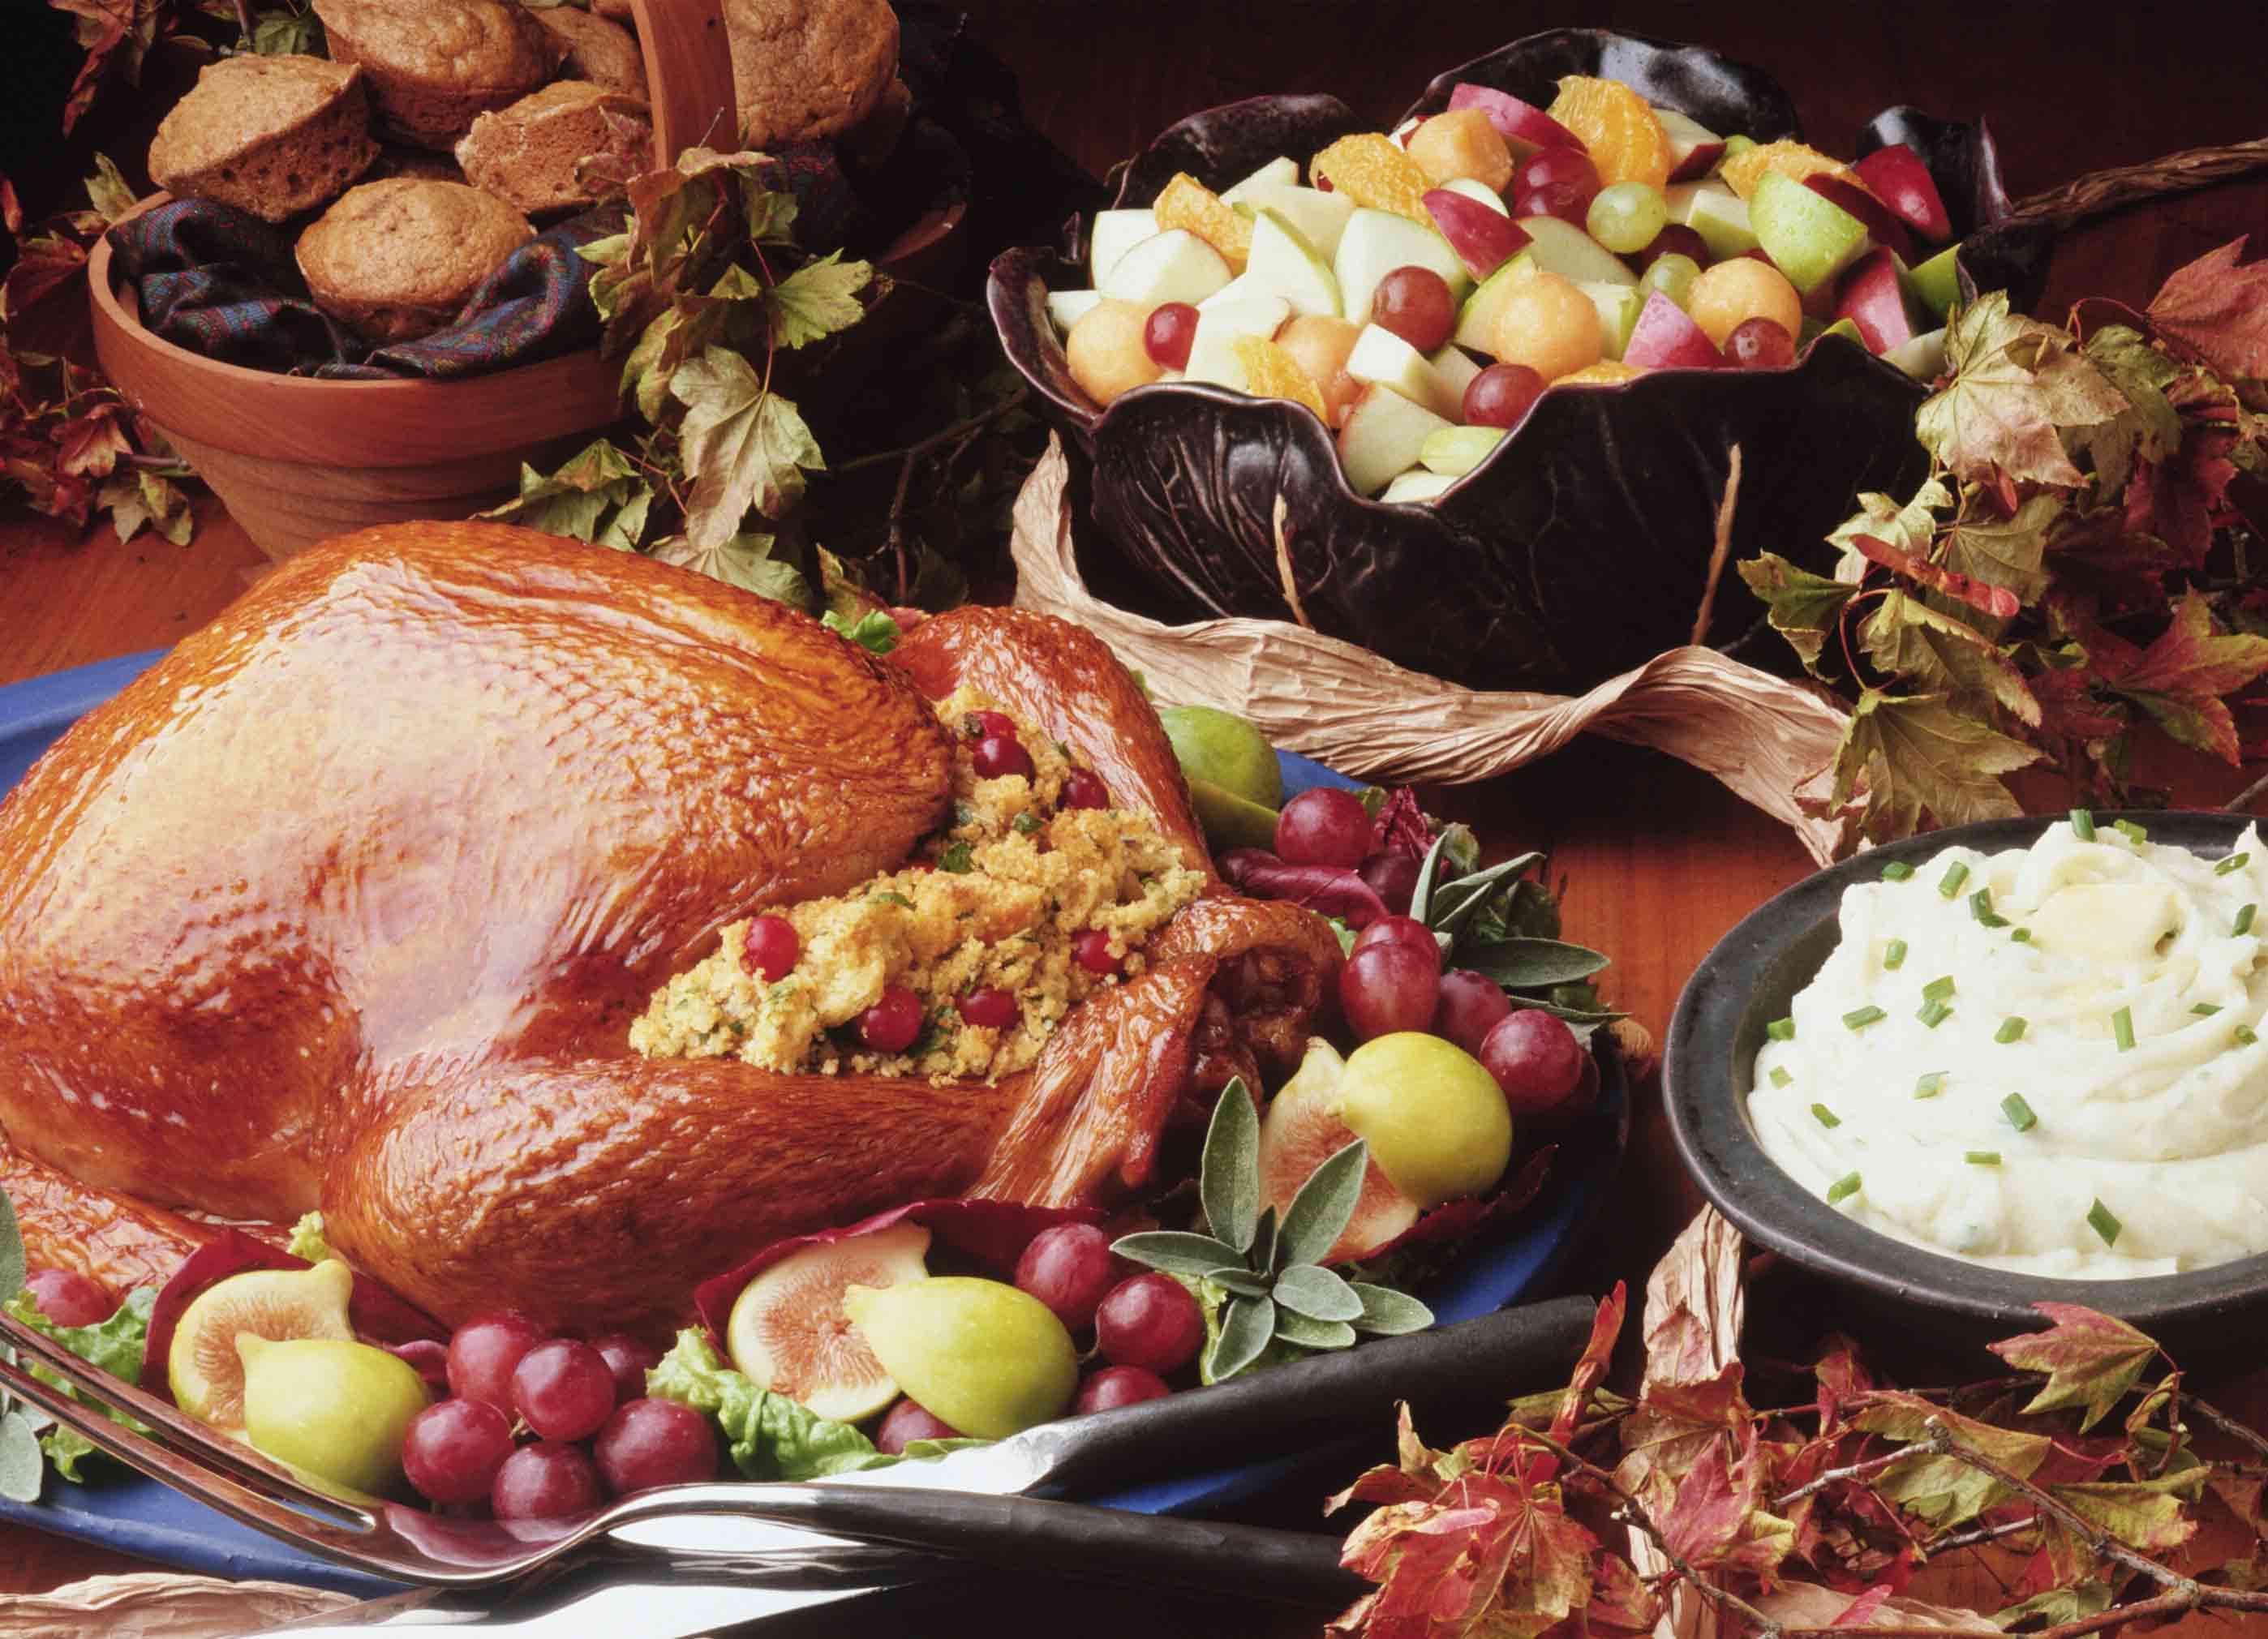 Restaurant Thanksgiving Dinner  Northern Michigan Restaurants Serving Thanksgiving Dinner